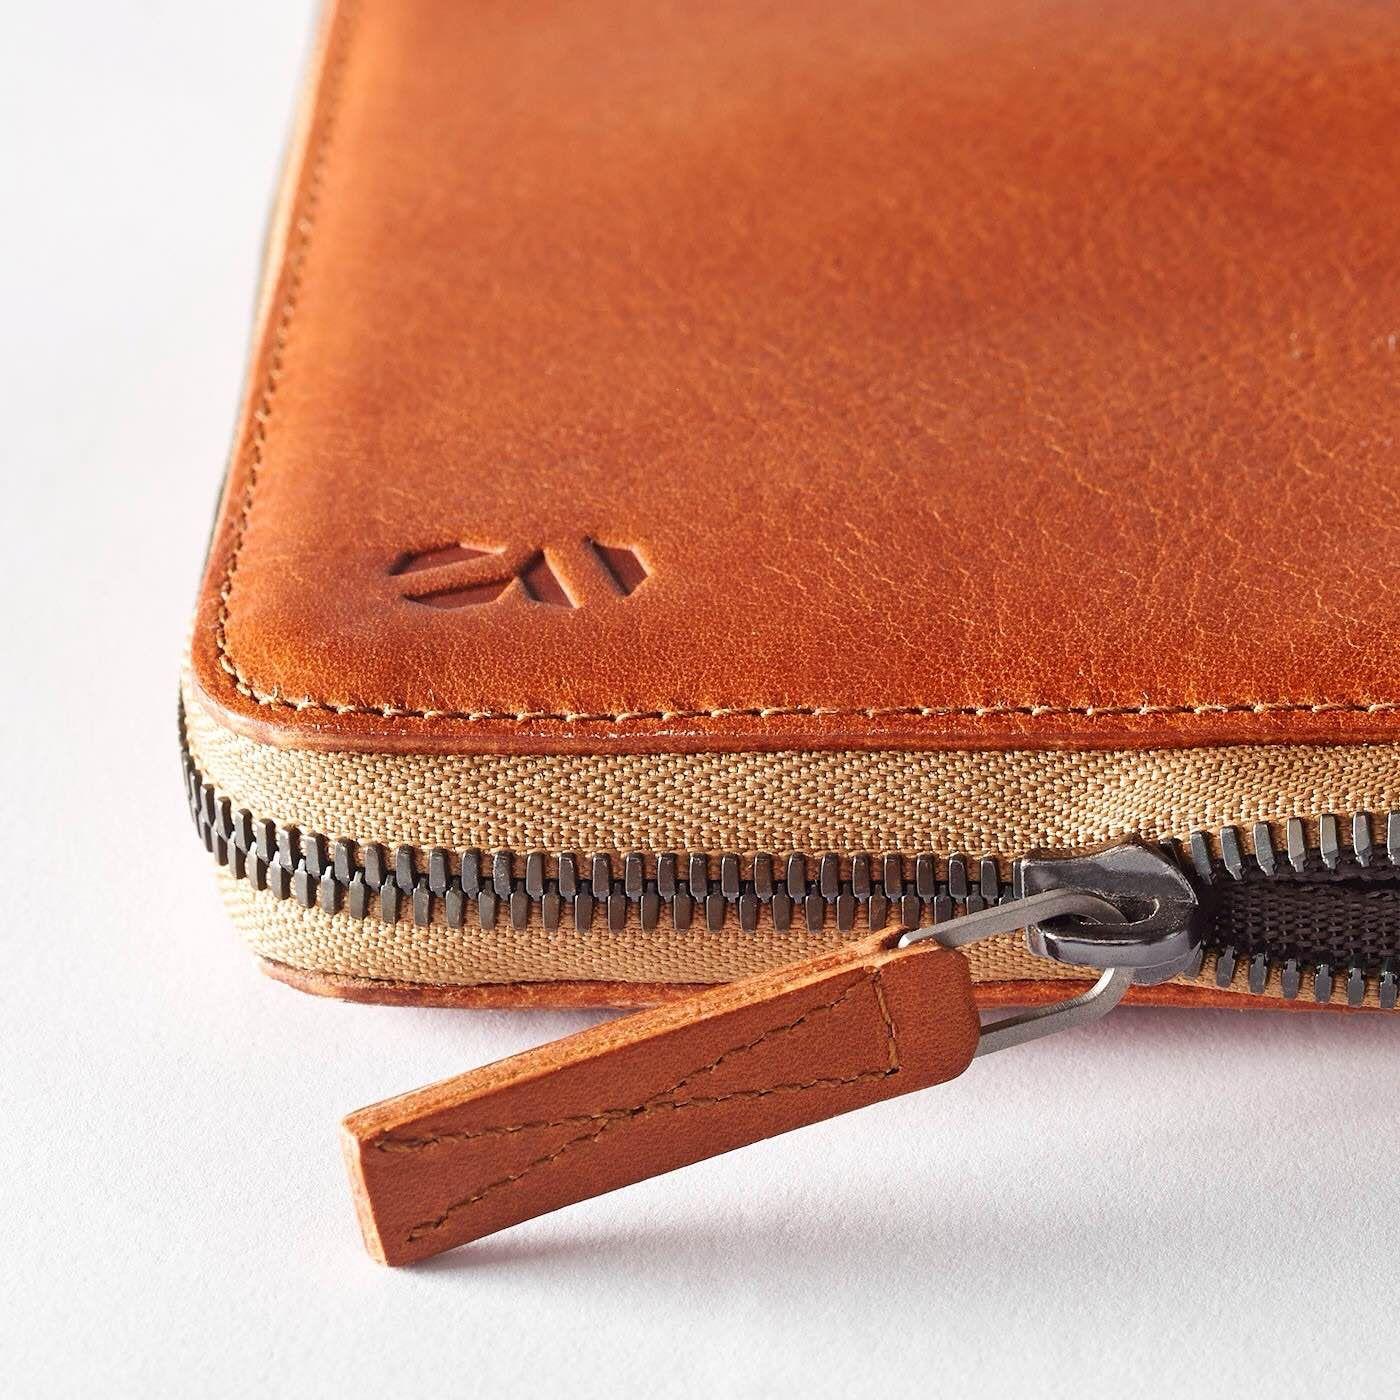 octovoleatherfolioformacbook2 Leather, Zip around